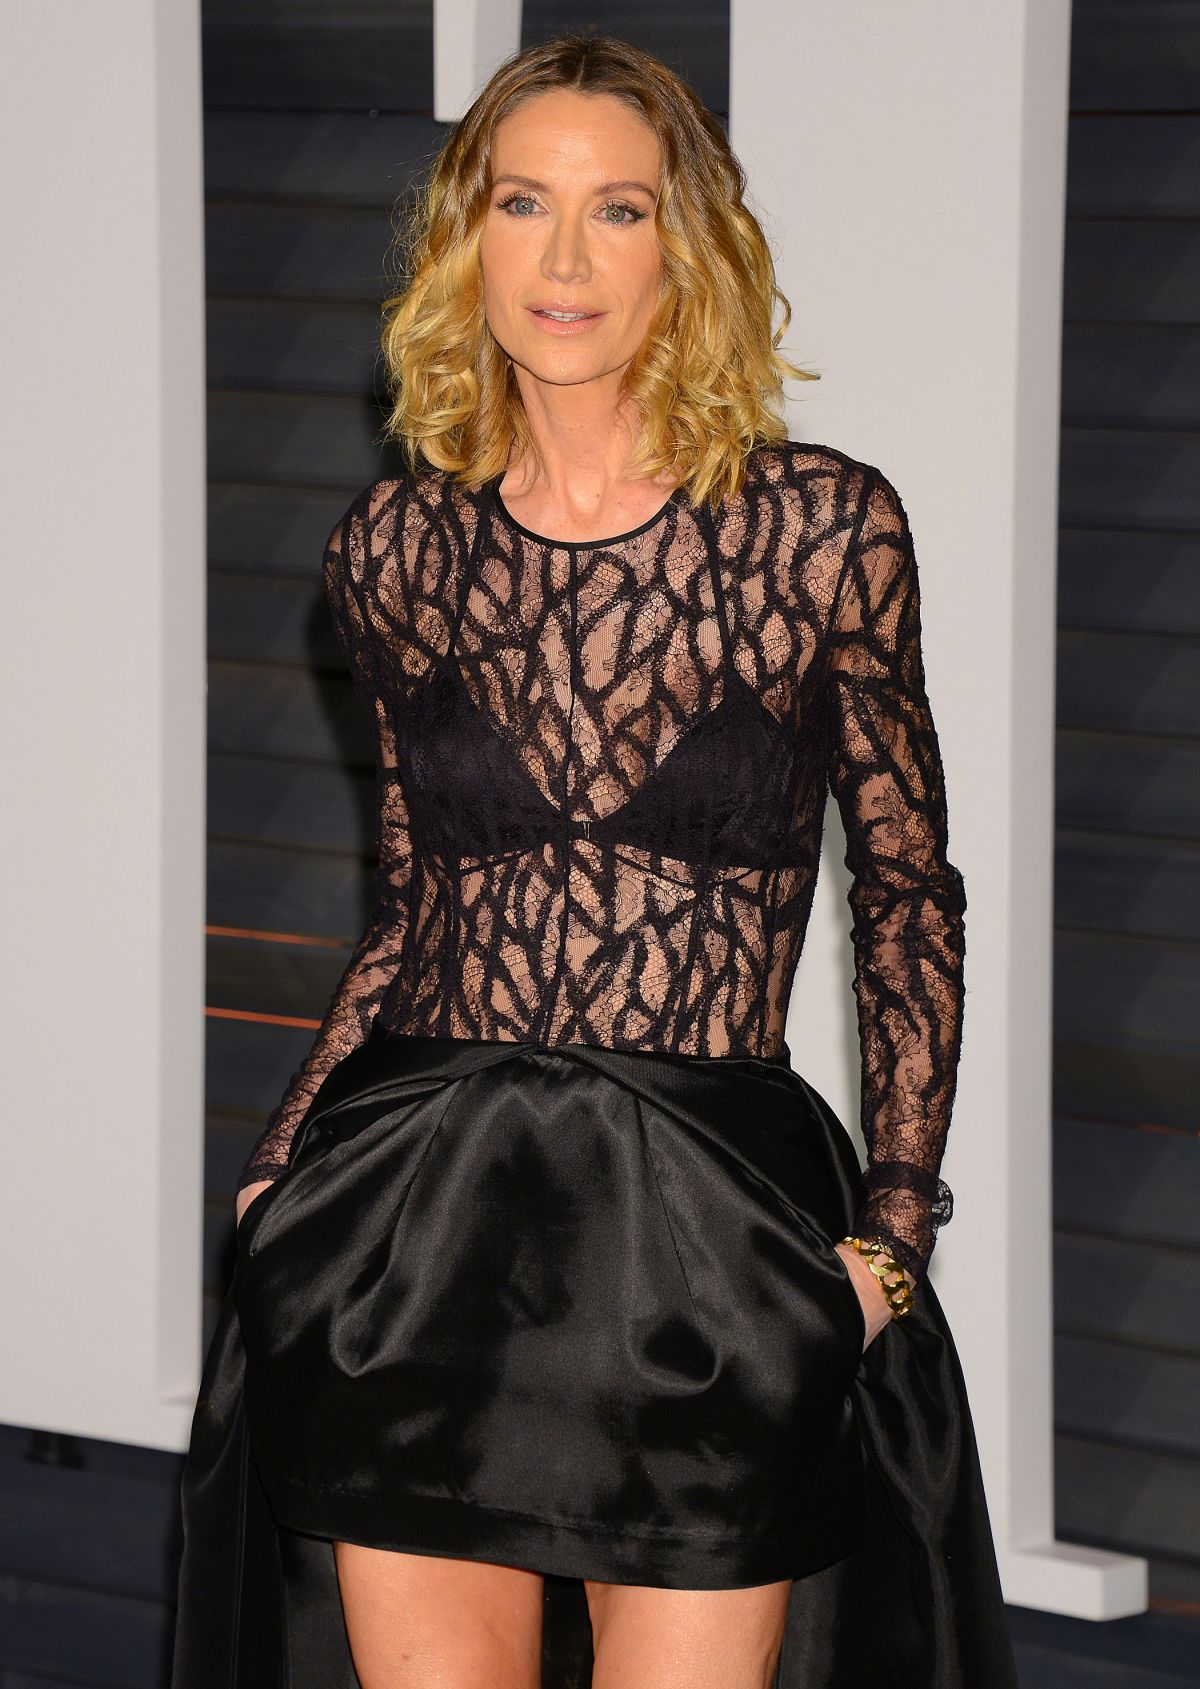 KELLY LYNCH at Vanity Fair Oscar Party in Hollywood